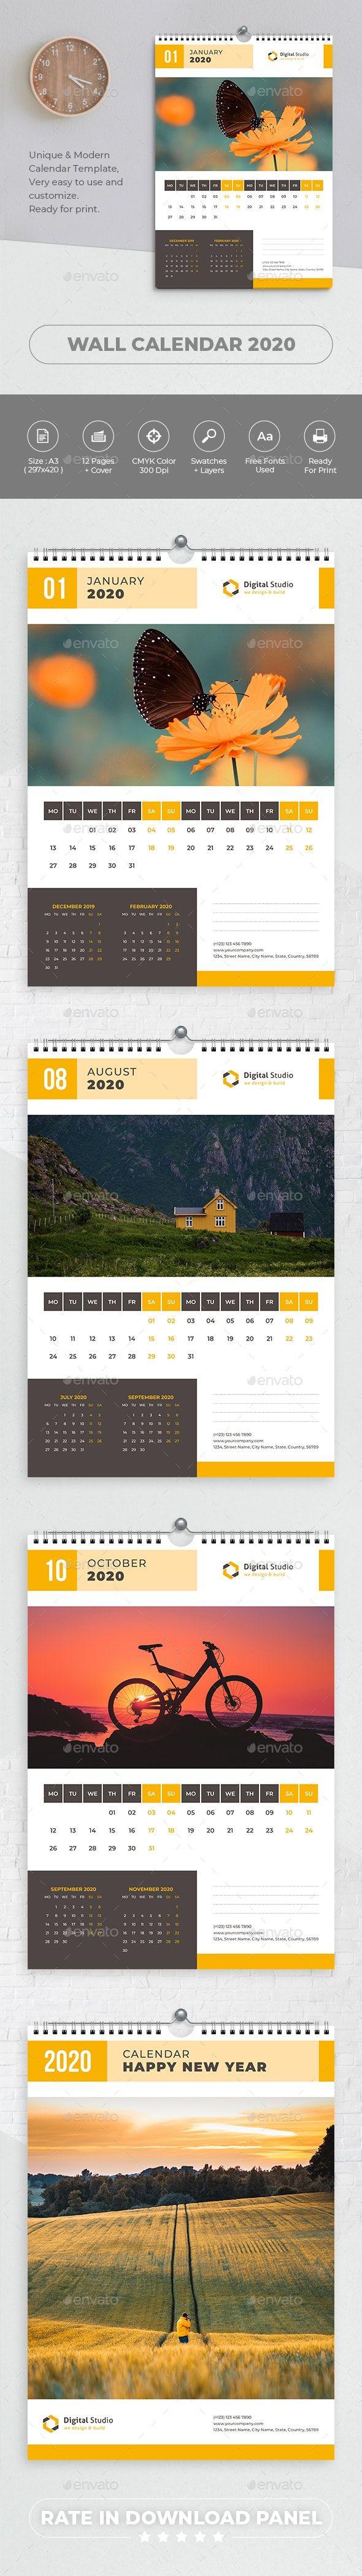 2020 Calendar Indesign